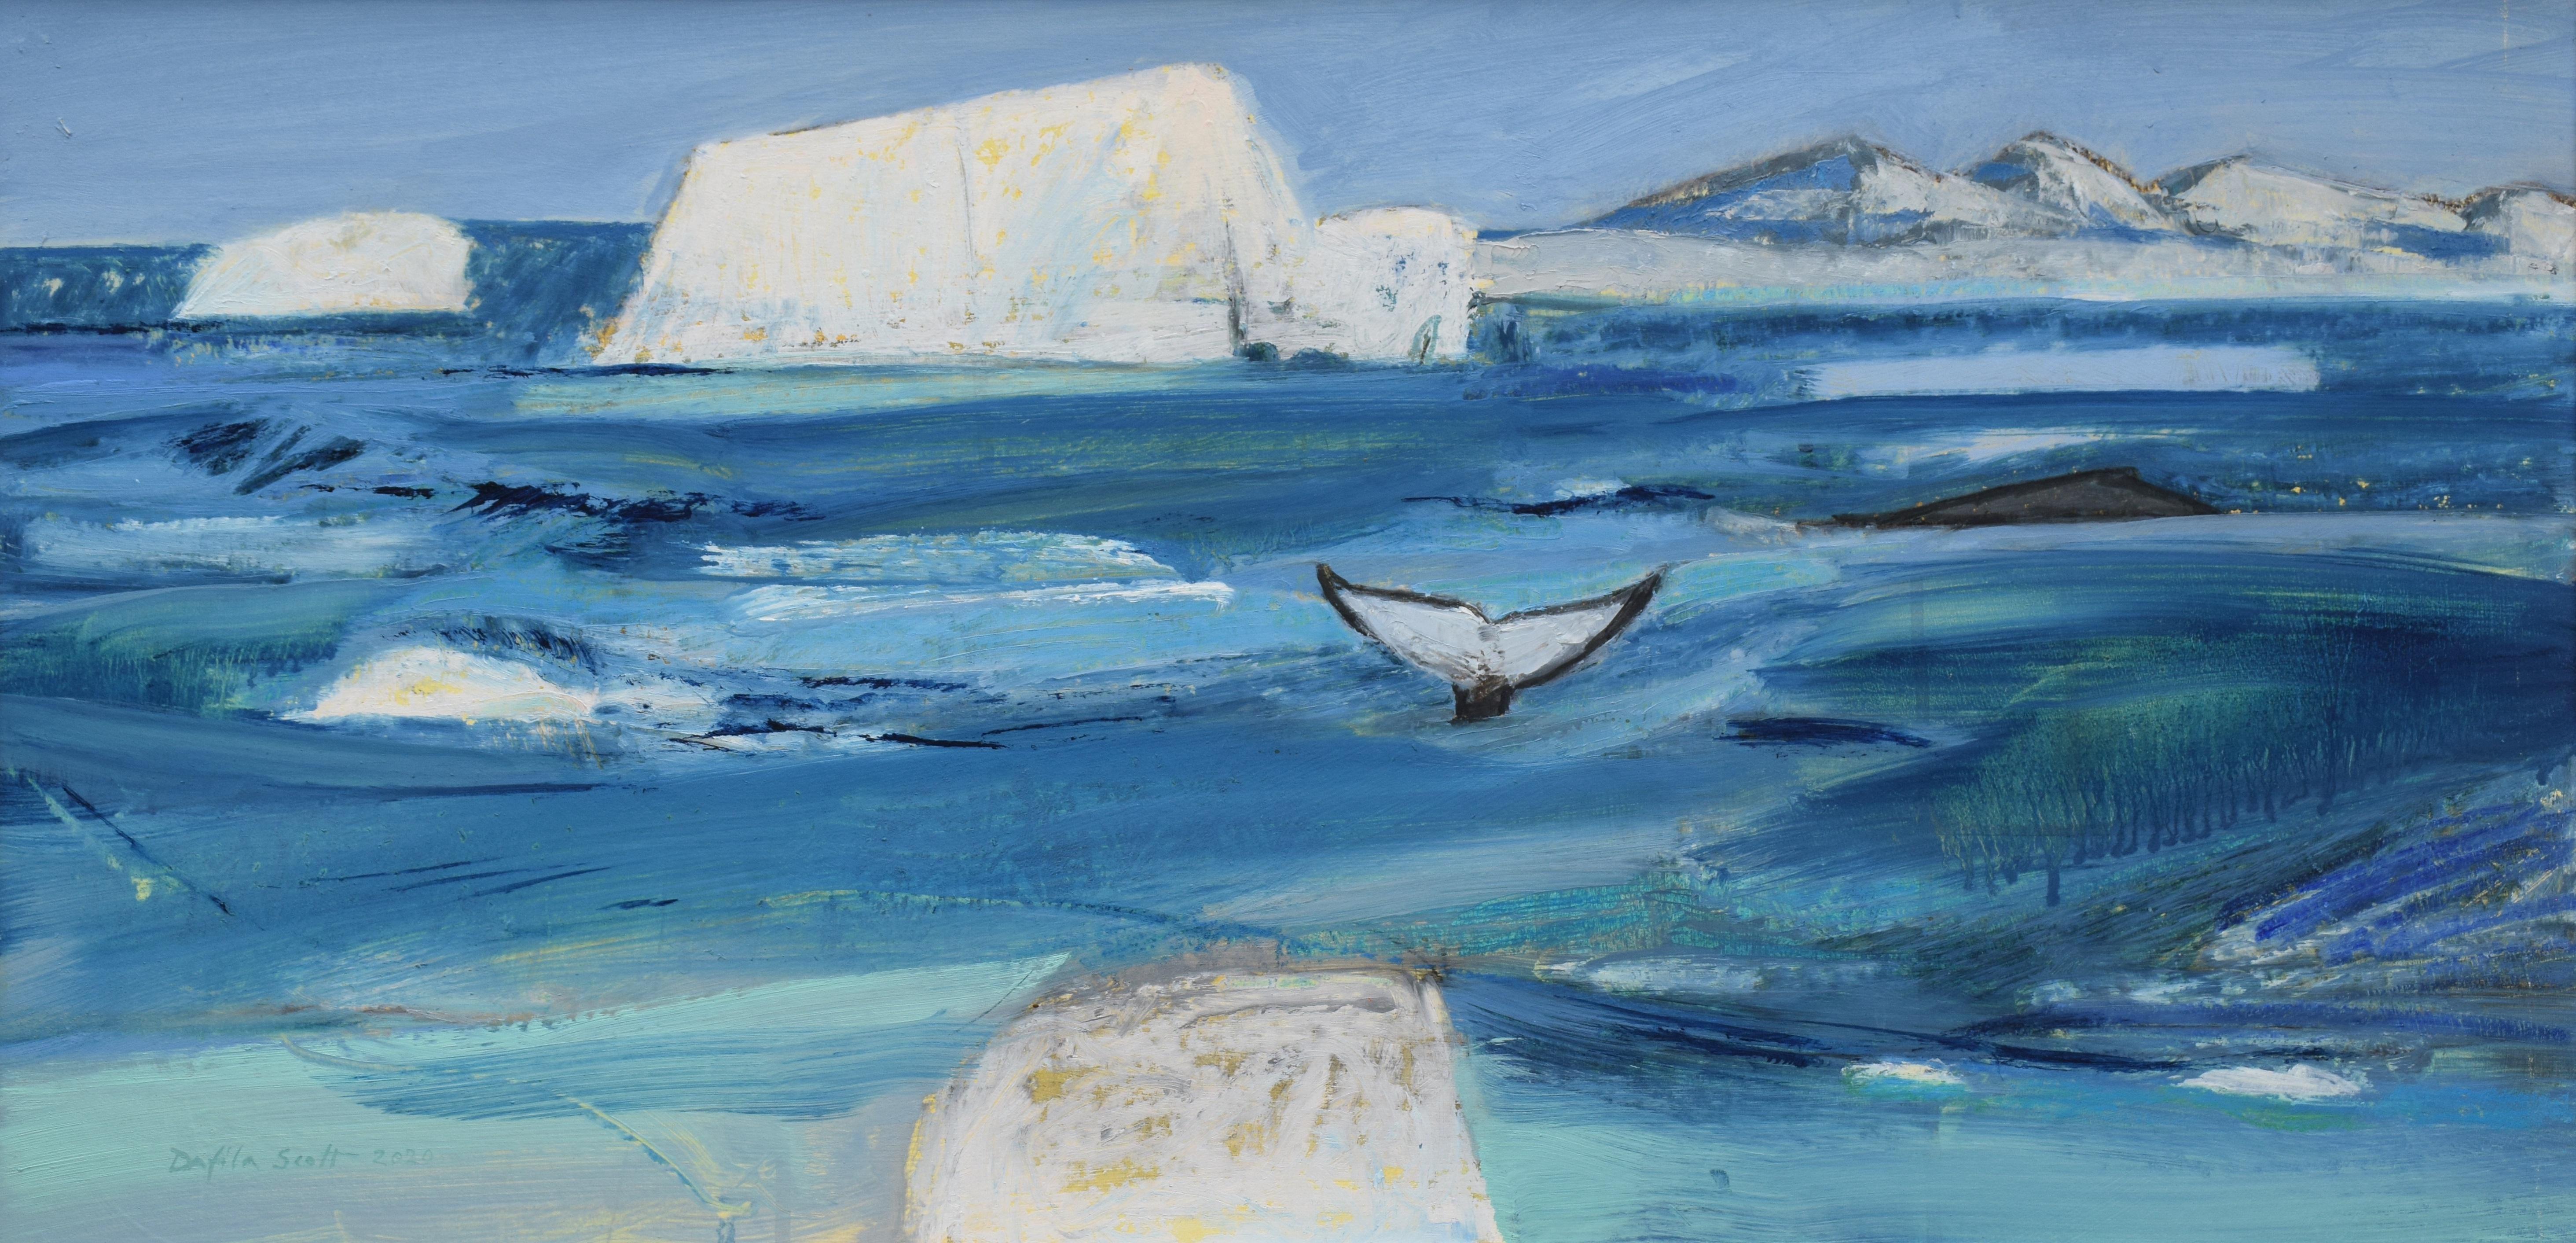 <p>Humpback Whales in the Antarctic by Dafila Scott</p>